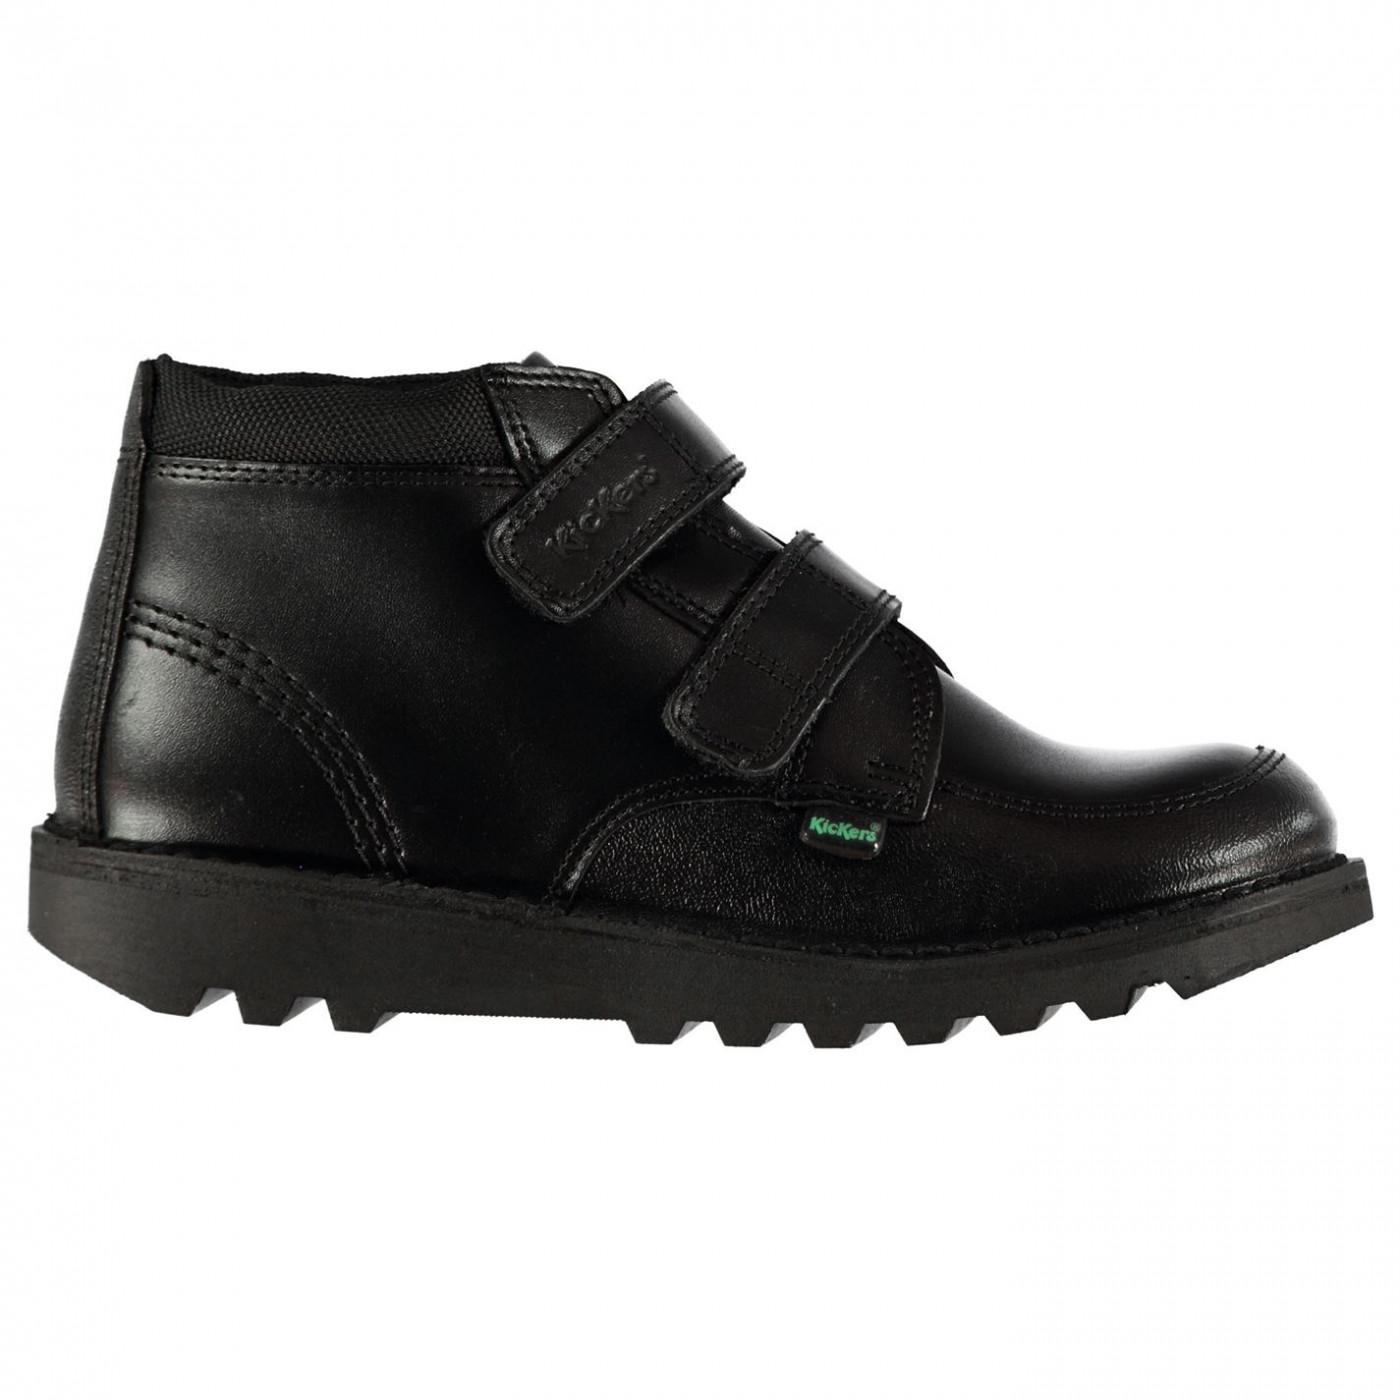 Kickers Hi Scuff Shoes